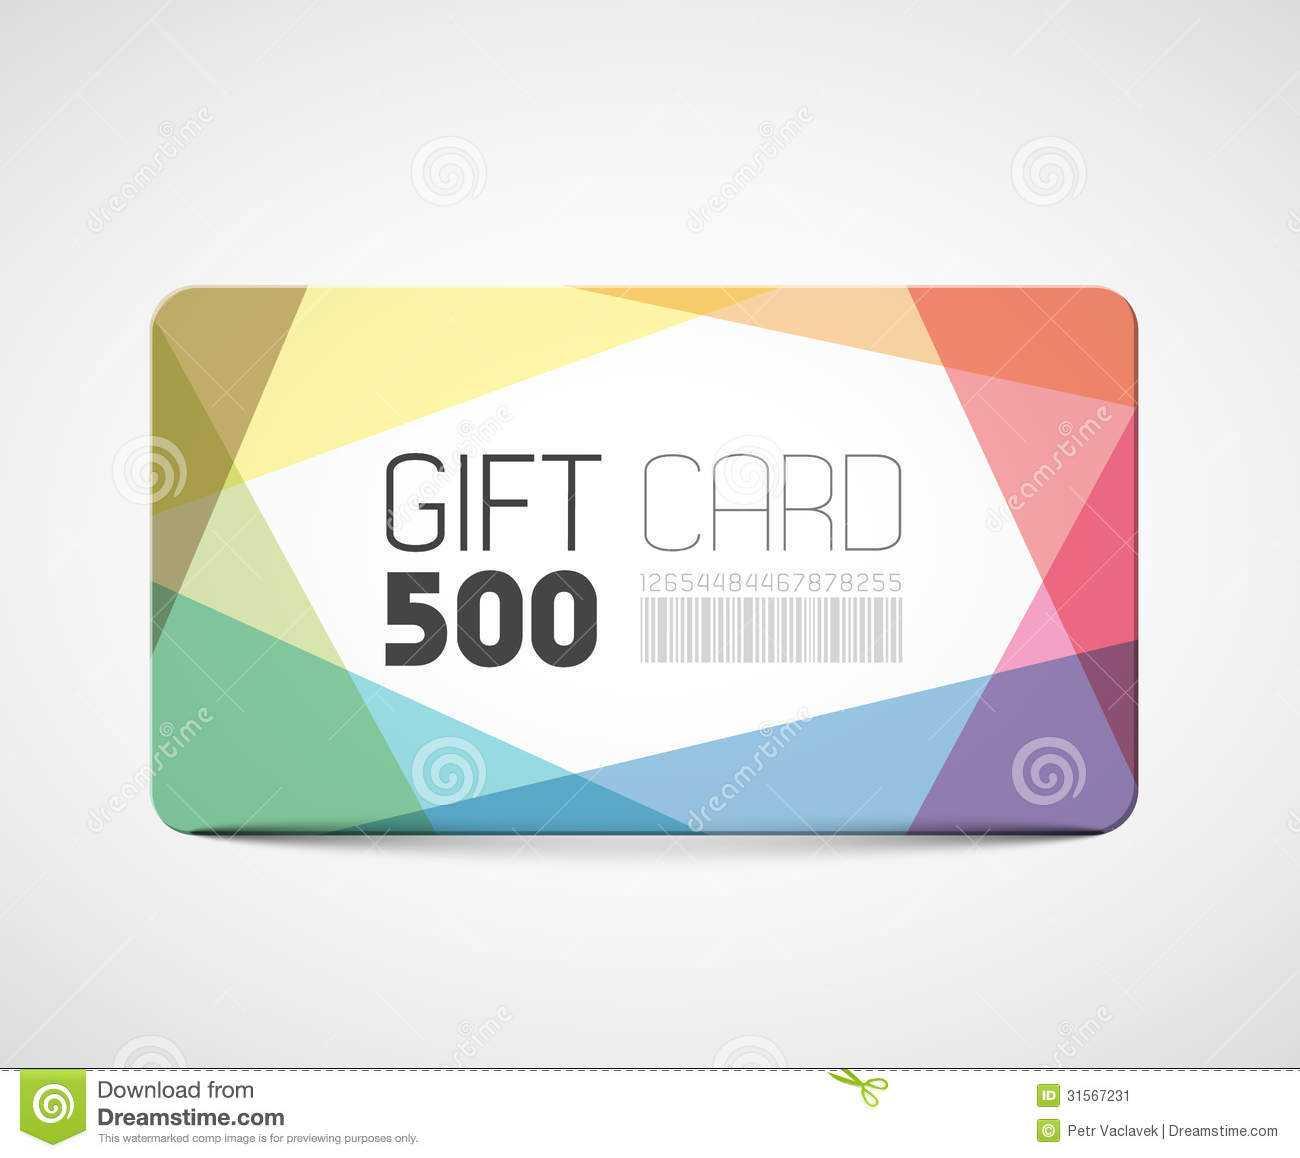 Modern Gift Card Template Stock Vector. Illustration Of With Regard To Gift Card Template Illustrator